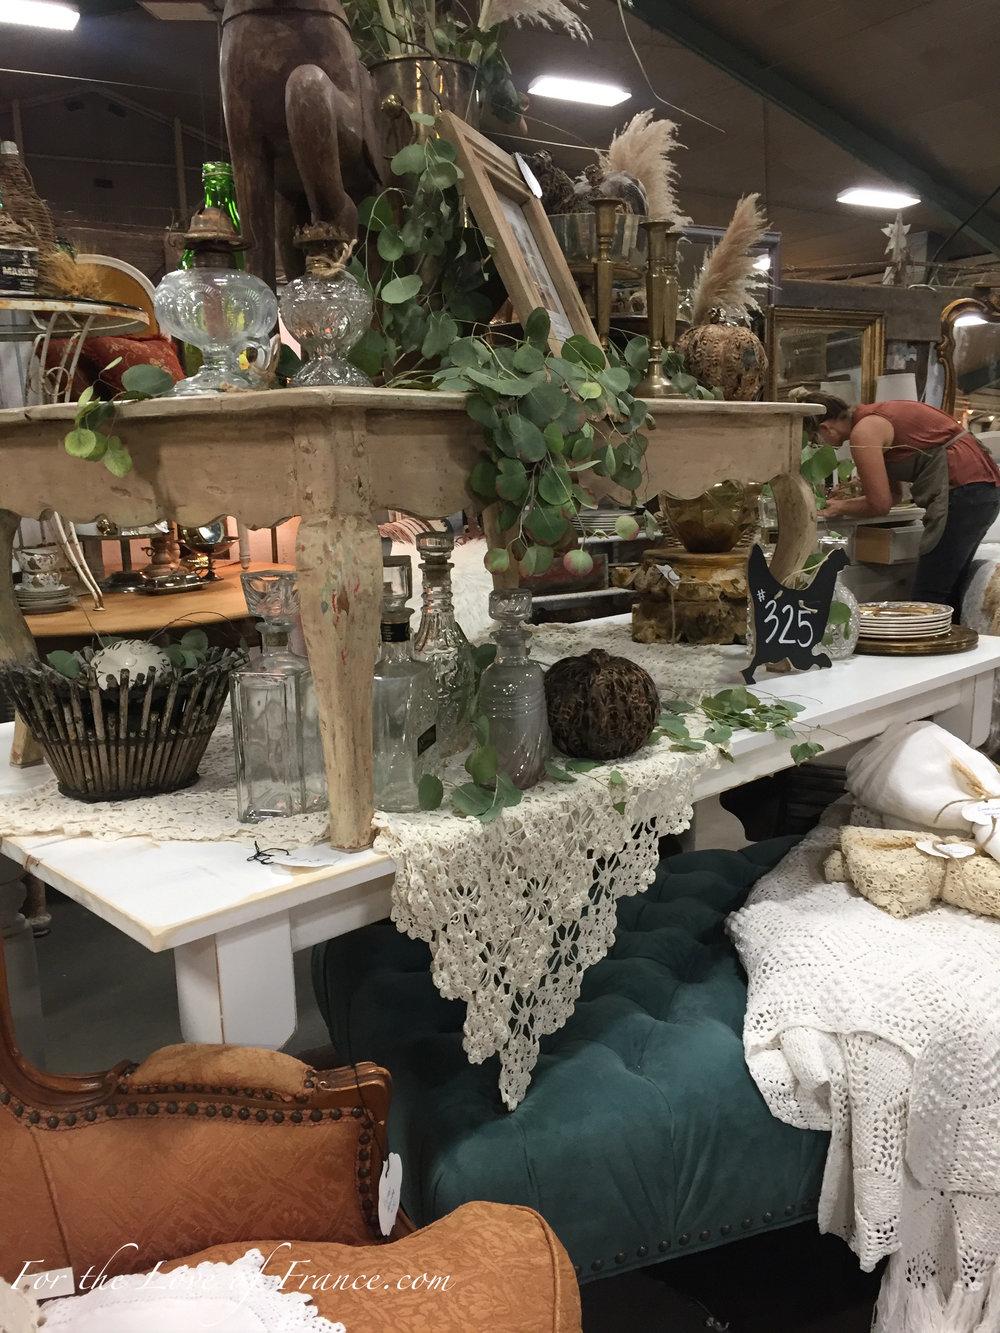 Vintage tables, picture frames, baskets, ottoman